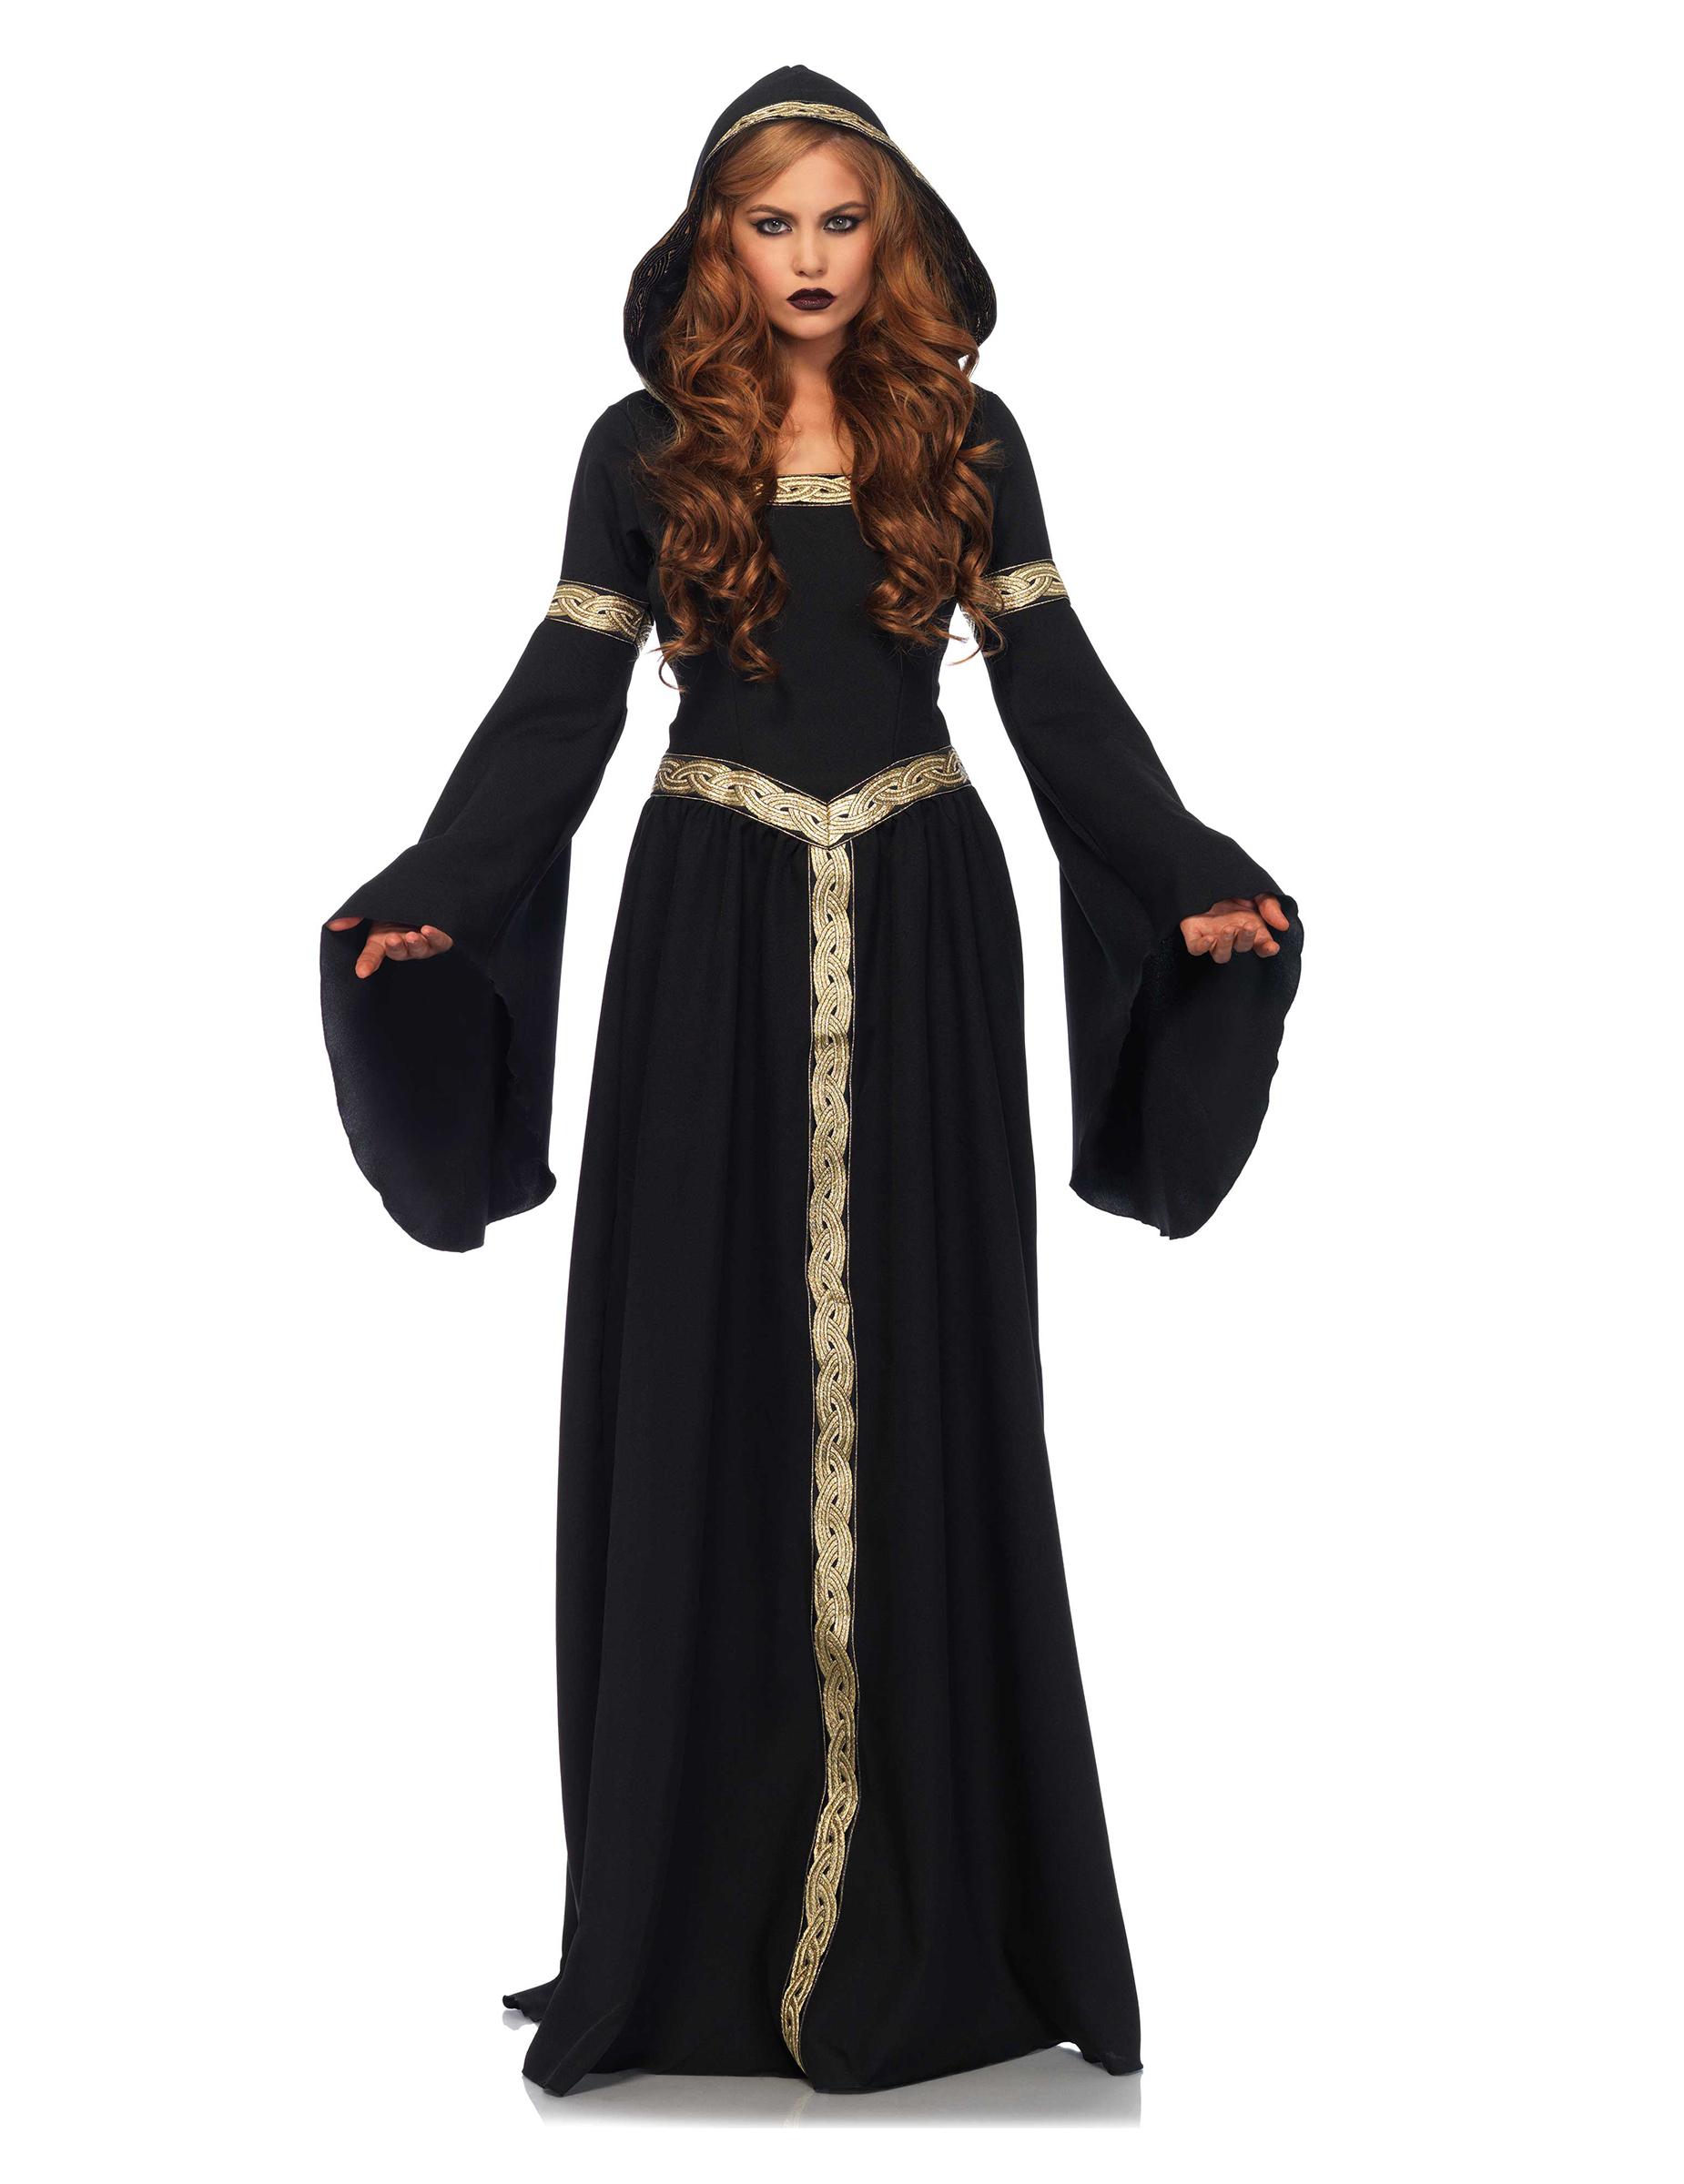 d guisement sorci re celtique femme halloween deguise. Black Bedroom Furniture Sets. Home Design Ideas